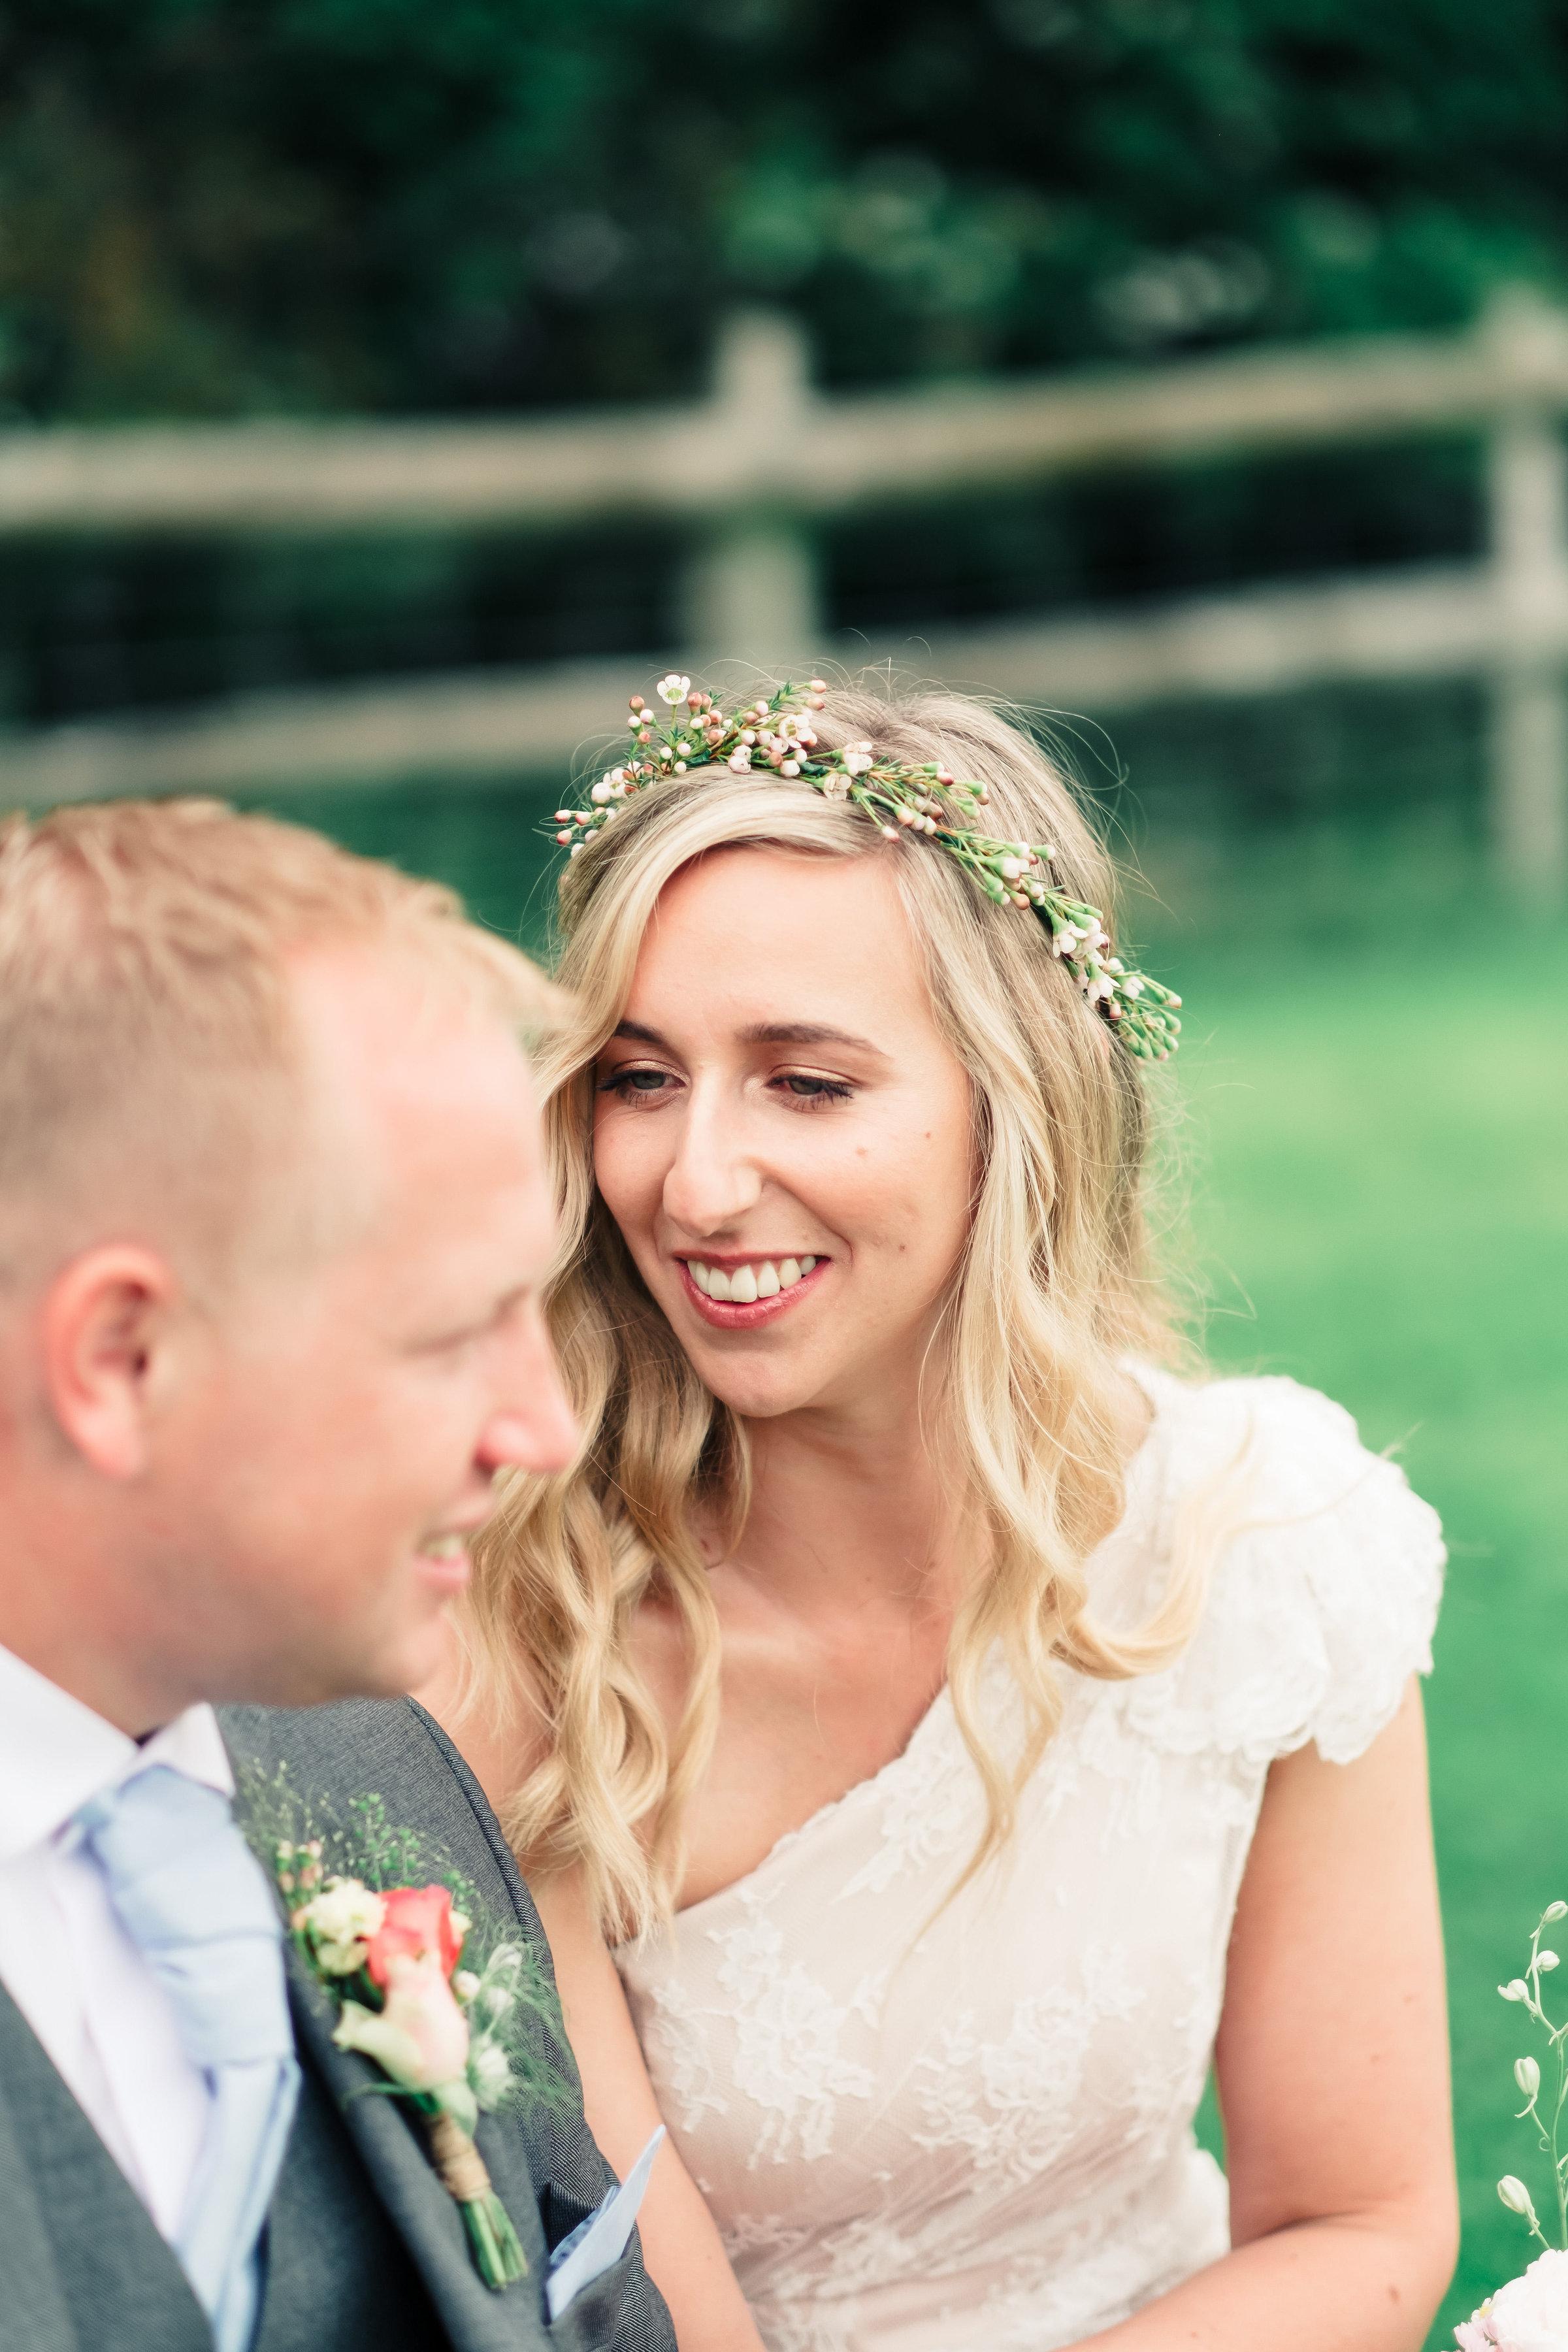 Natural glowing bronzed bride